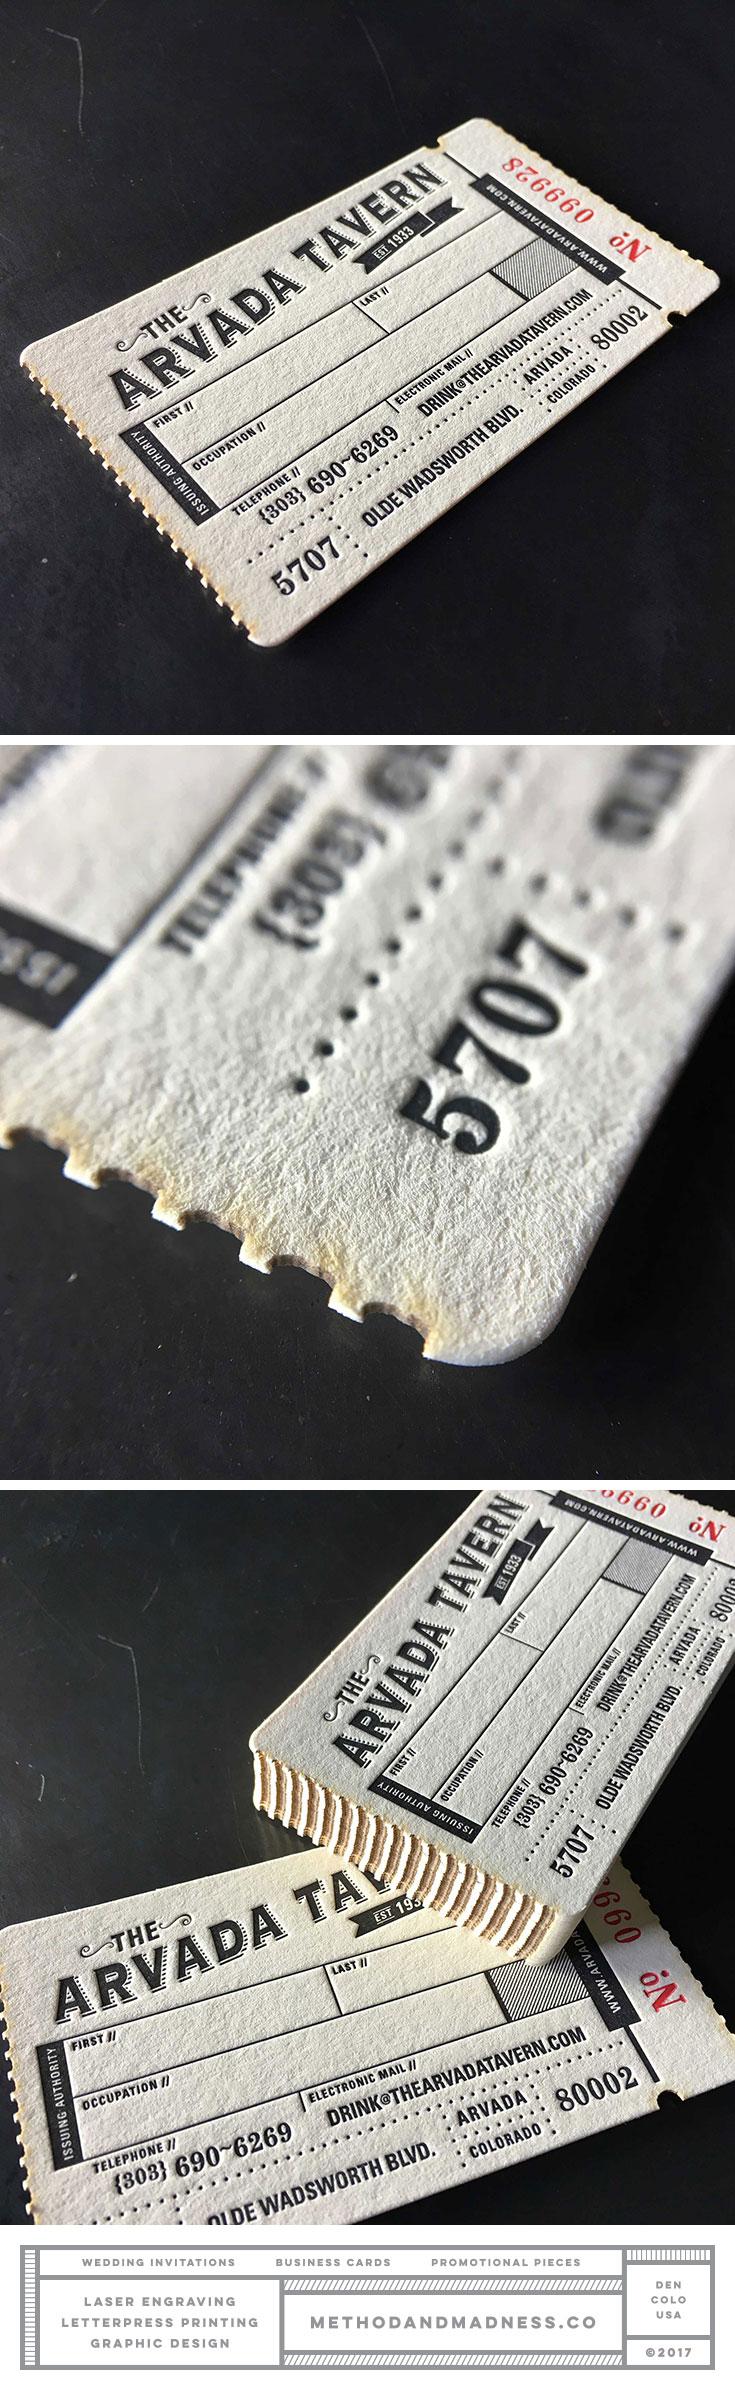 Vintage style letterpress business cards using crash numbering and ...